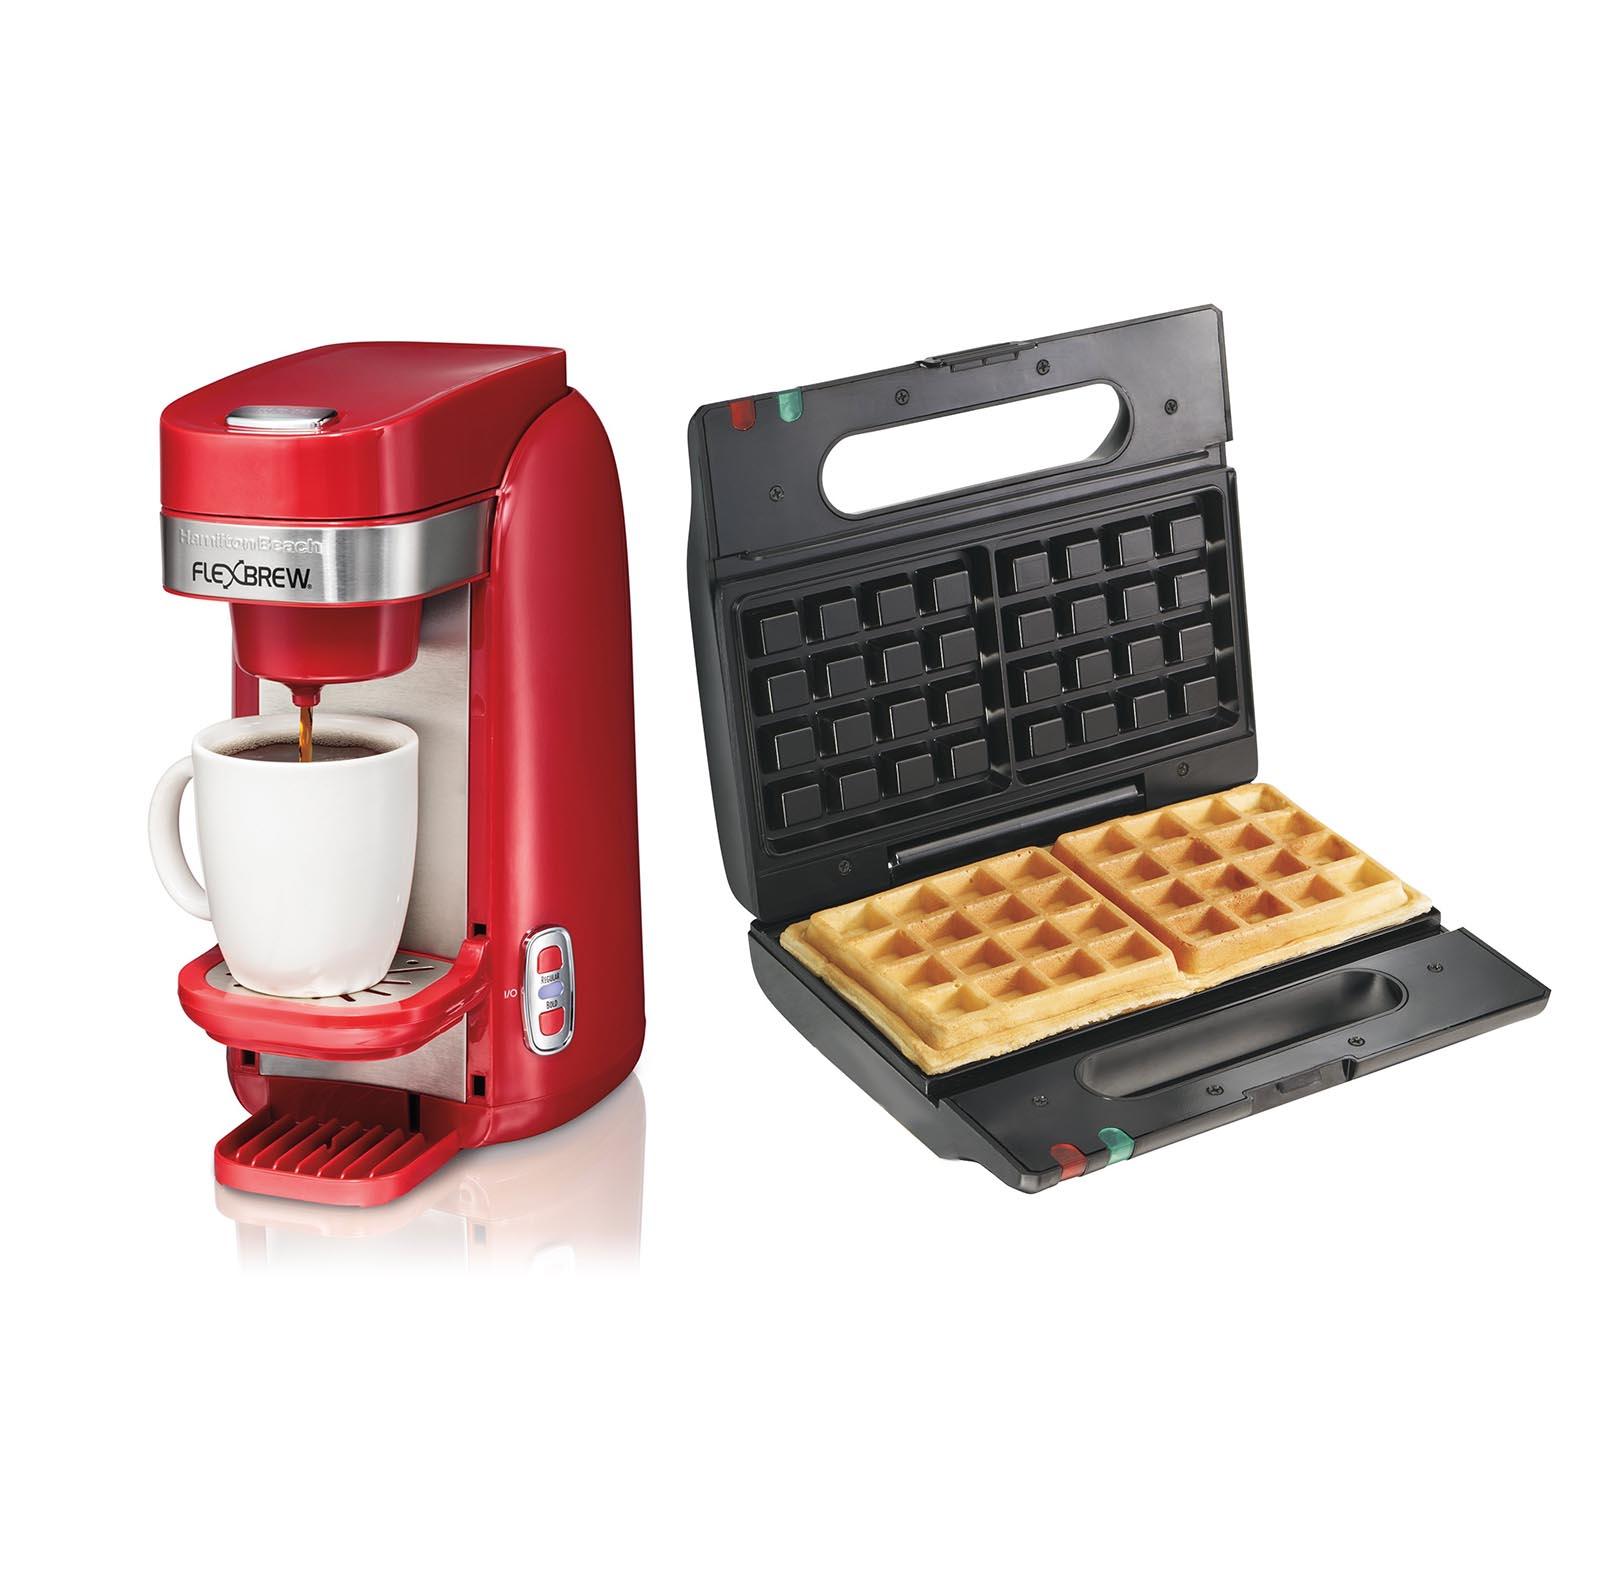 Hamilton Beach Single Serve Coffee Maker w/ Proctor Silex...